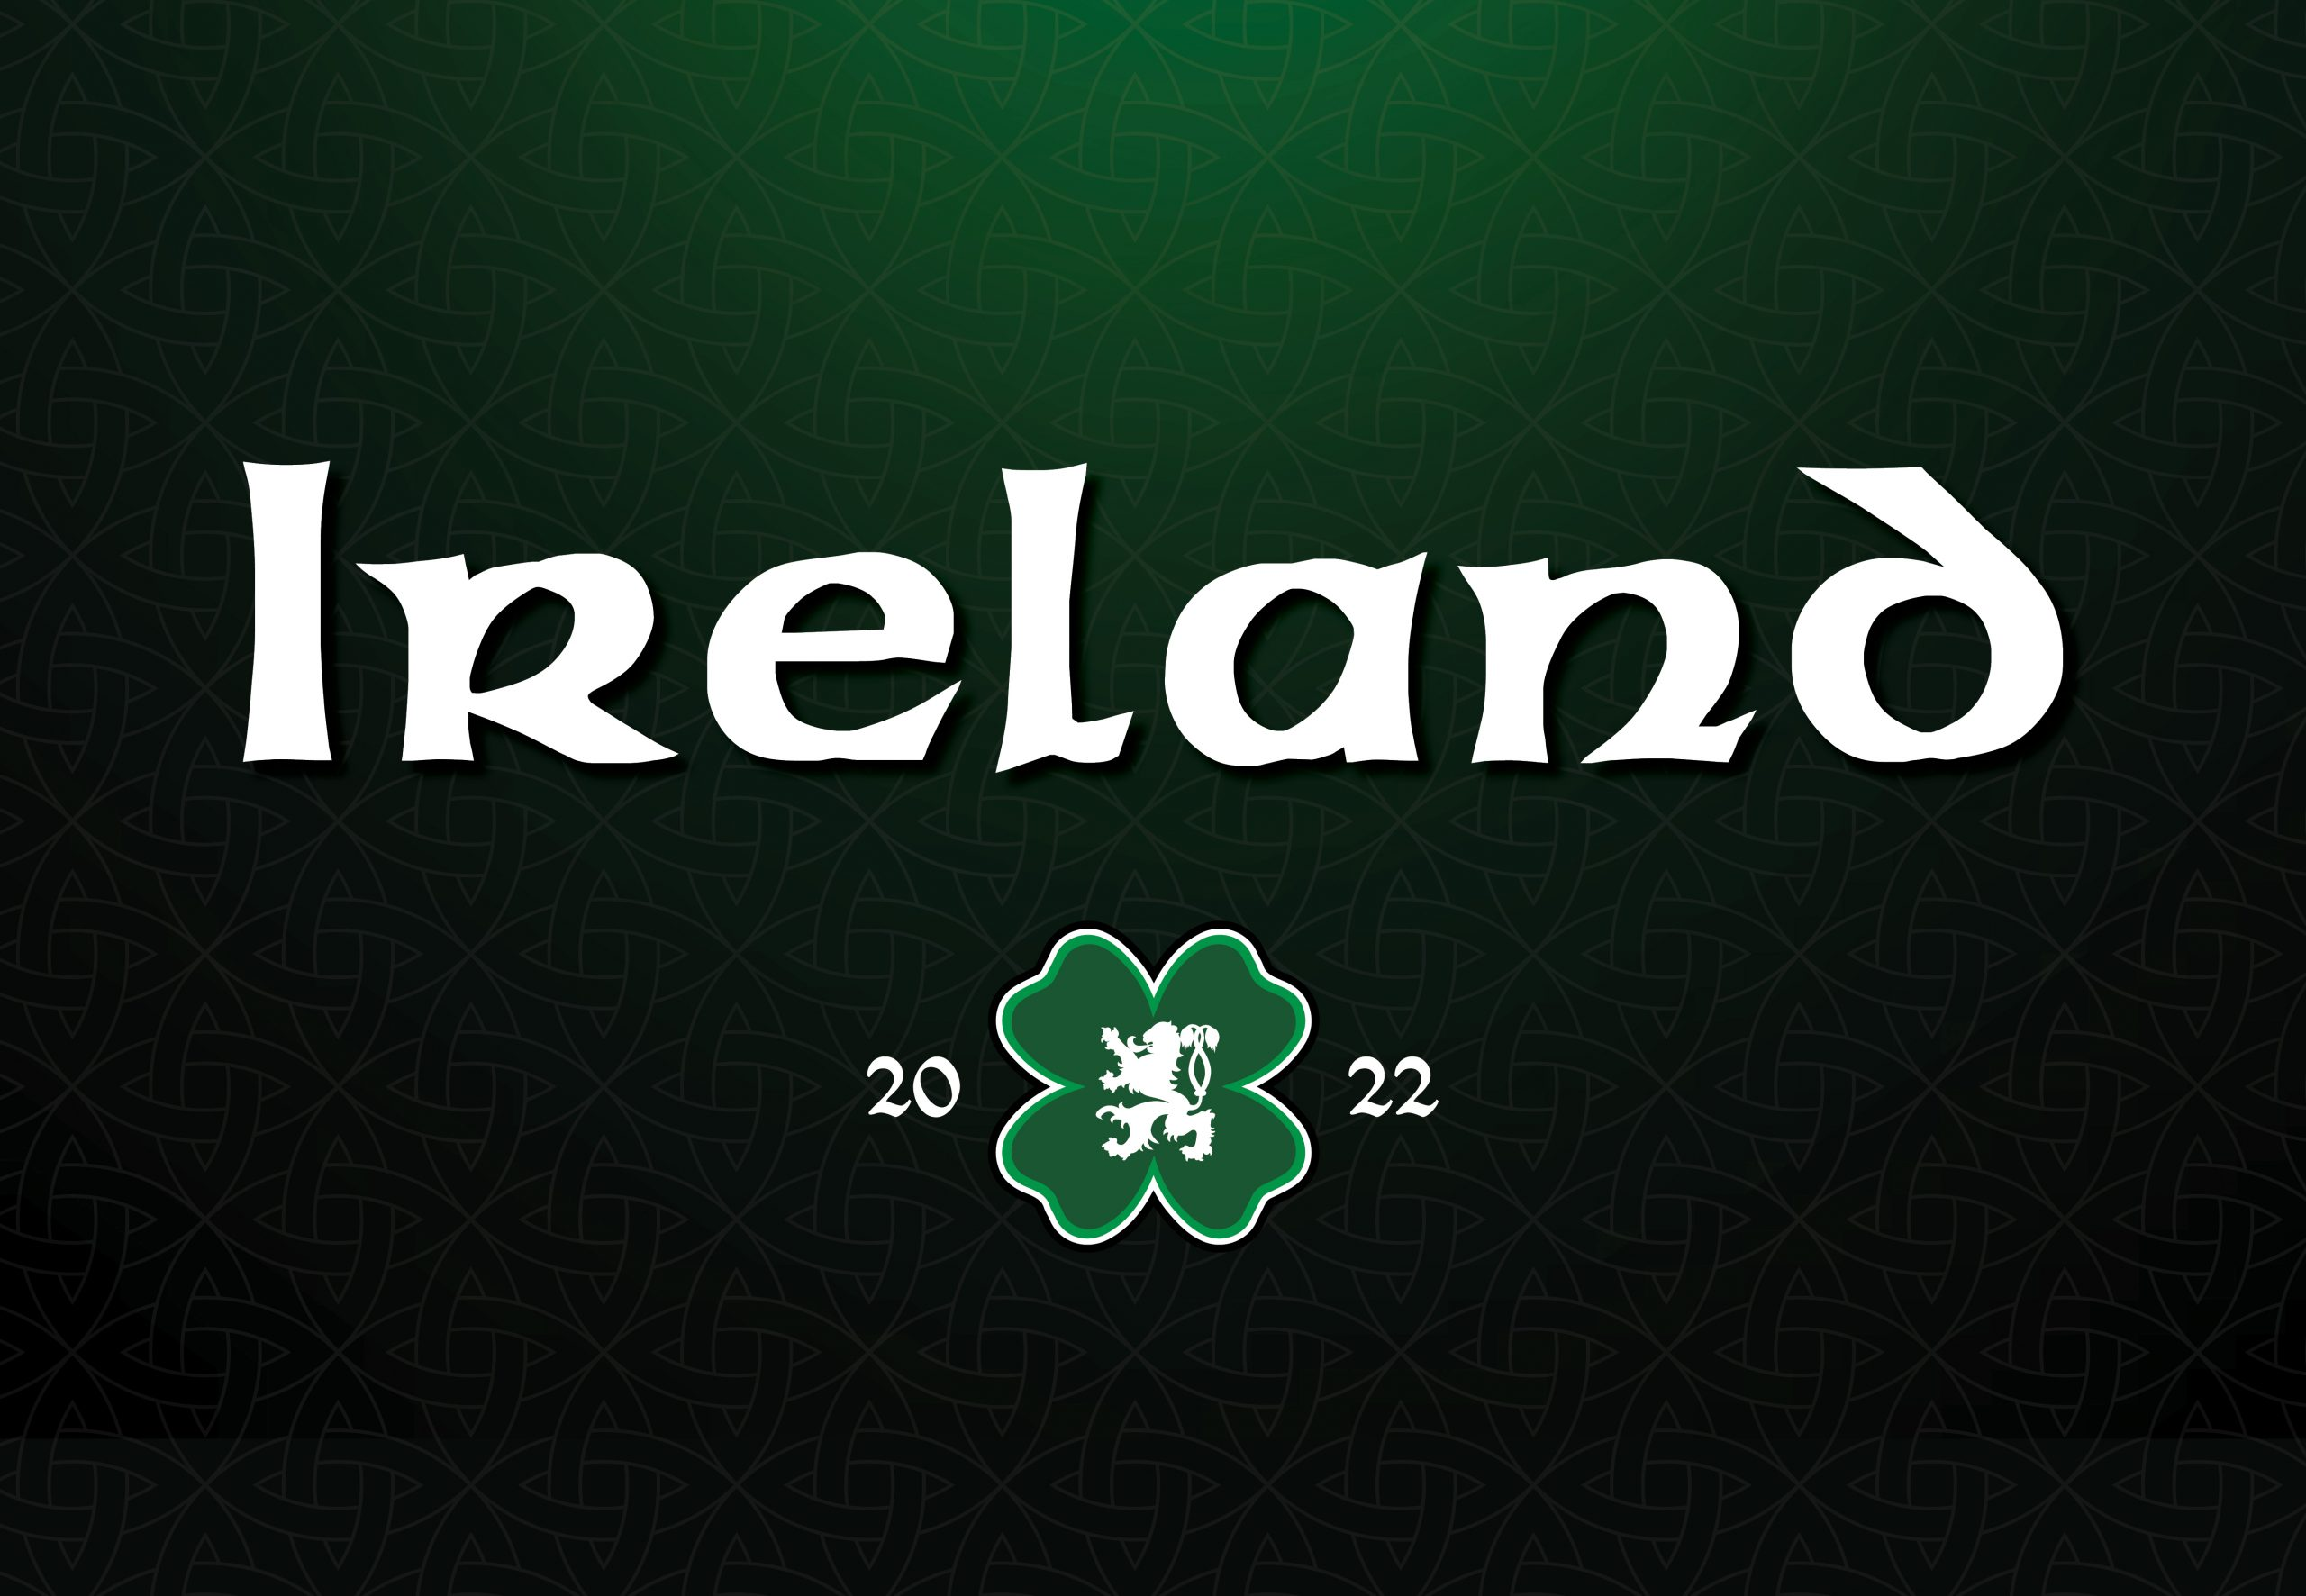 Ireland 2022